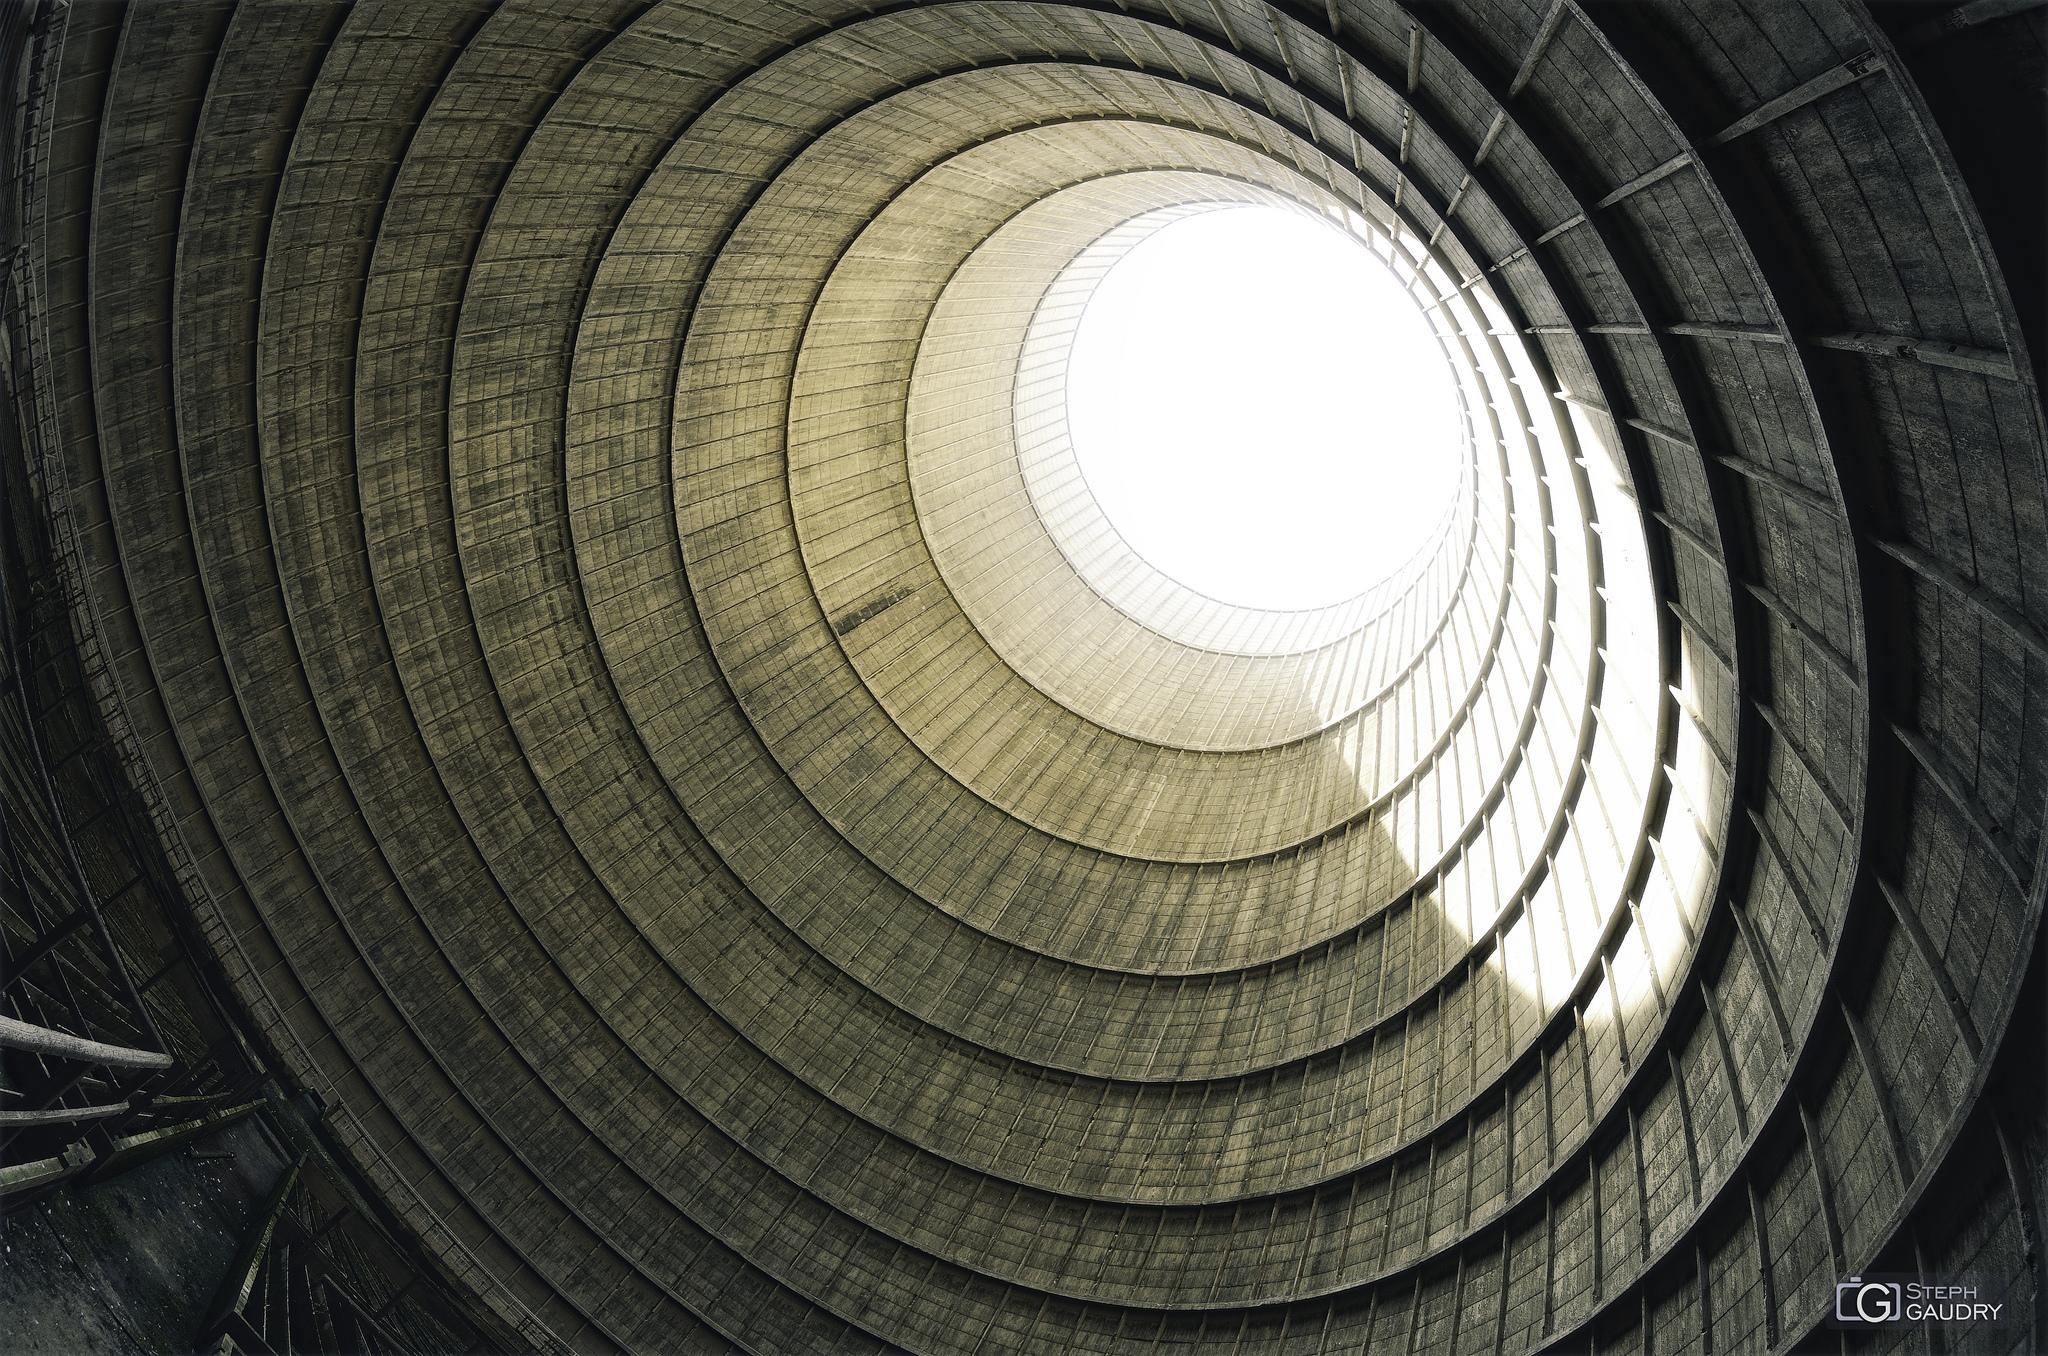 Cooling tower - Vertigo of the low-angle shot [Klik om de diavoorstelling te starten]